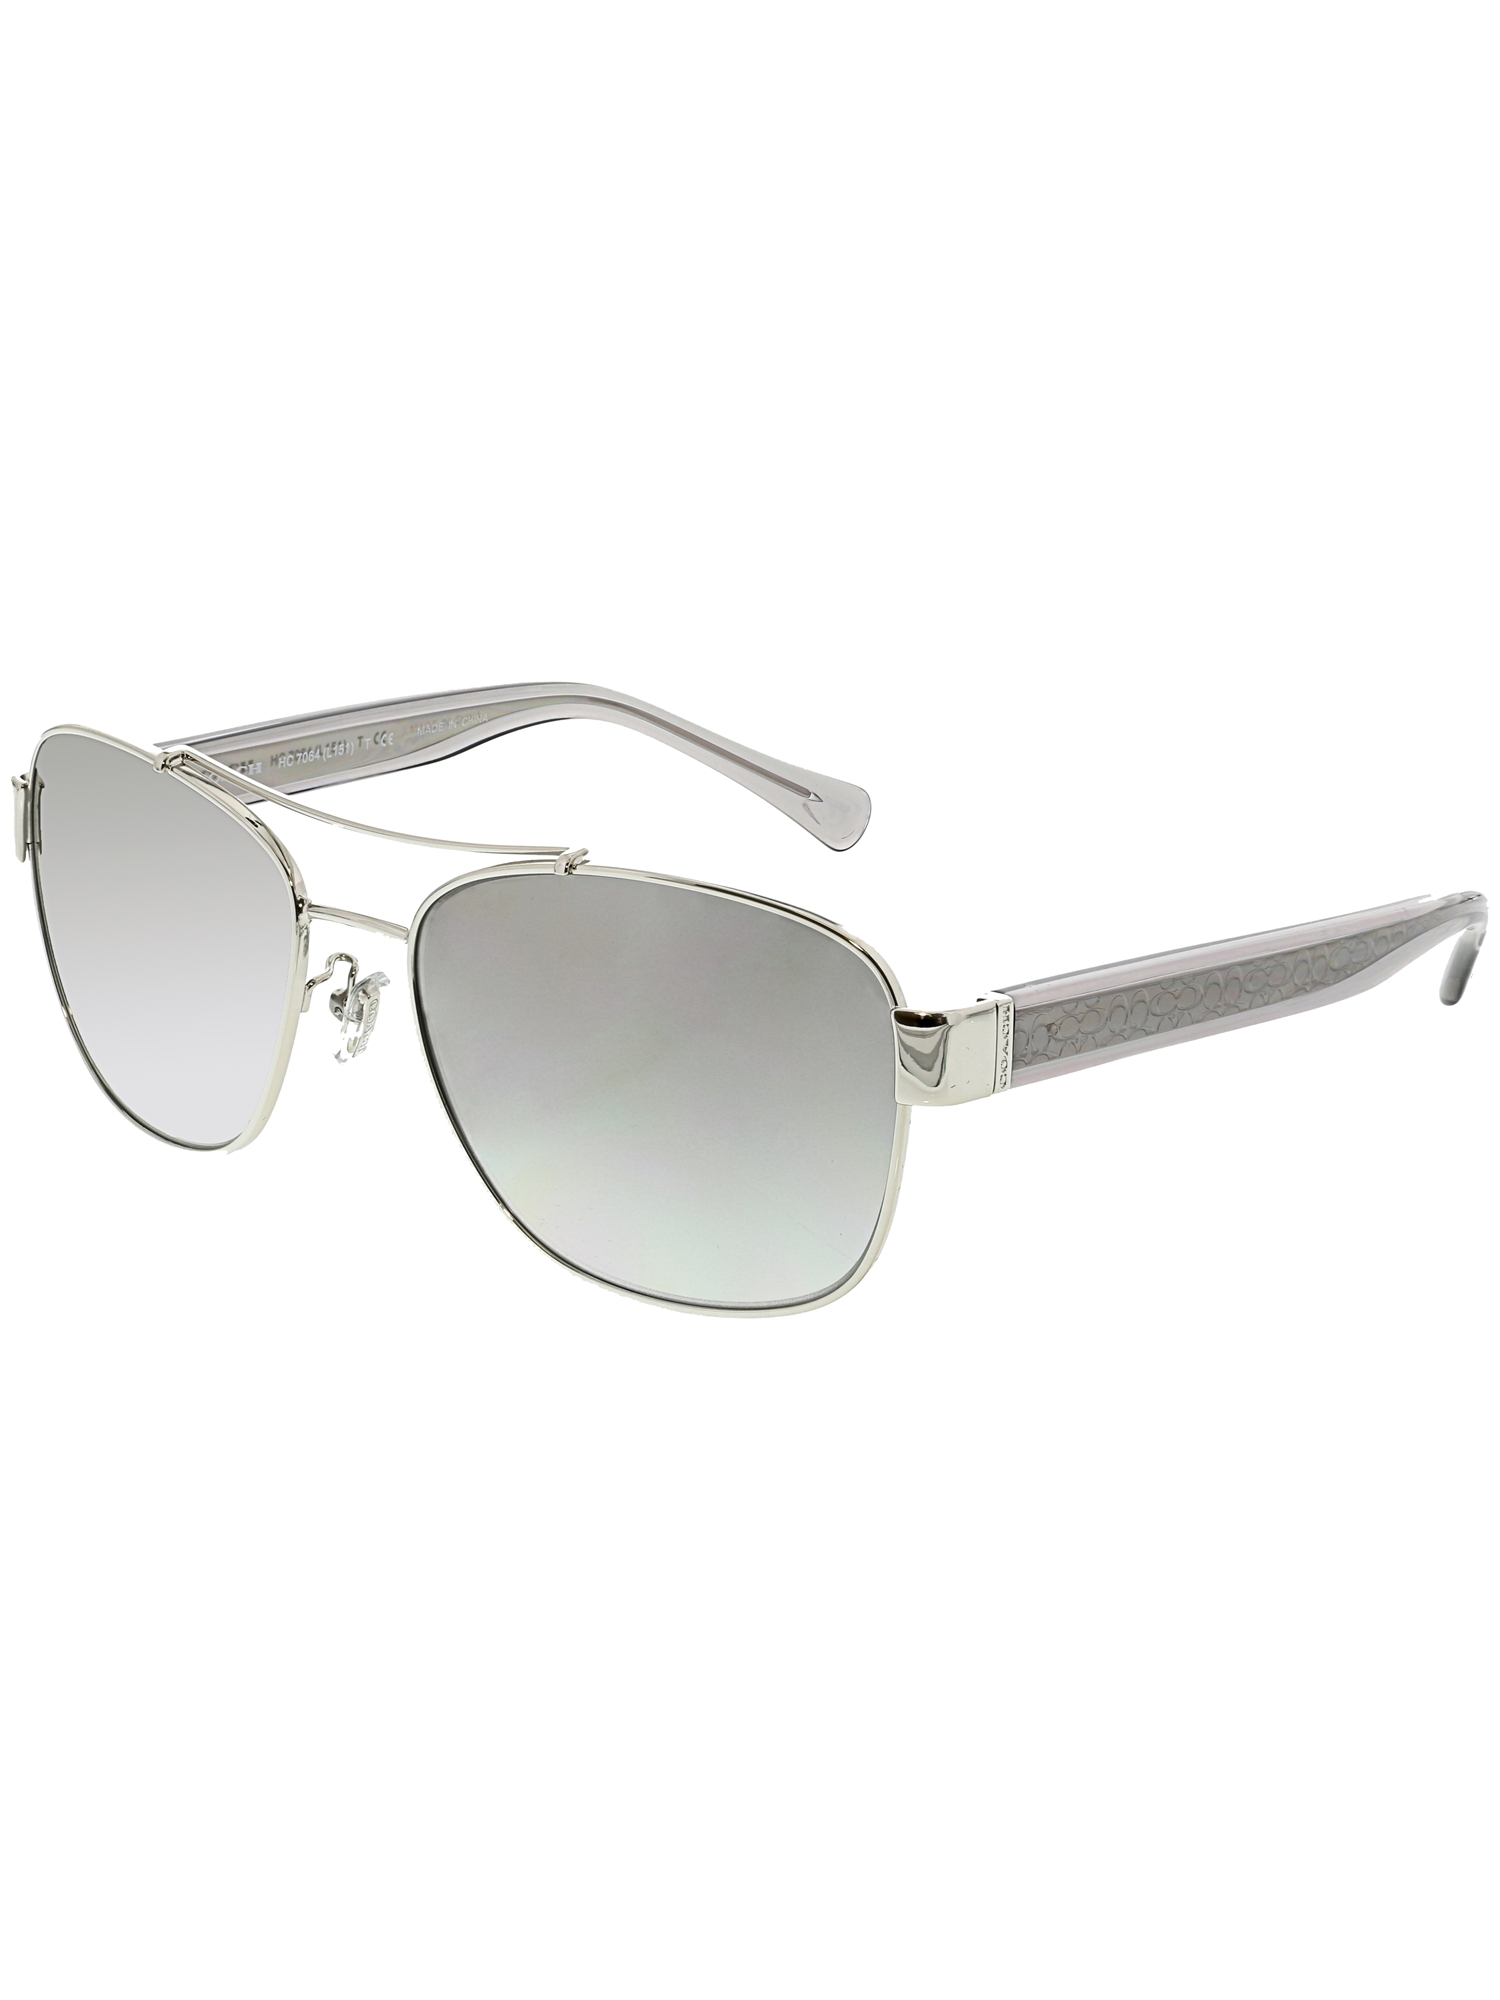 dff3989332be ... discount code for coach womens hc7064 926411 56 silver aviator  sunglasses 3e0ef 32c0d